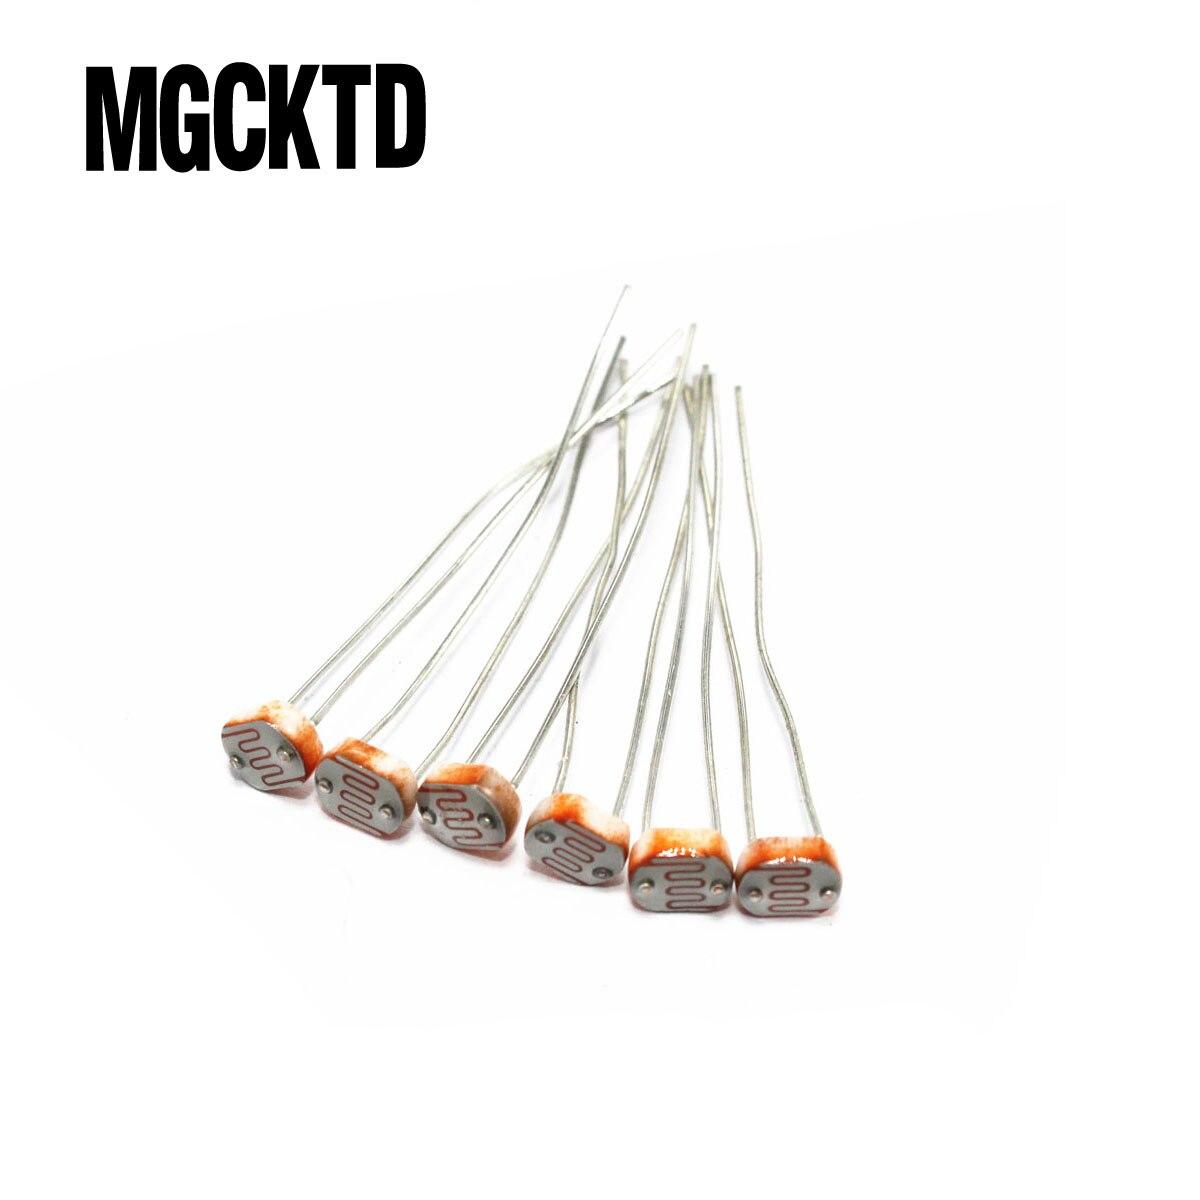 20pcs gl5516 5516 light dependent resistor ldr 5mm photoresistor